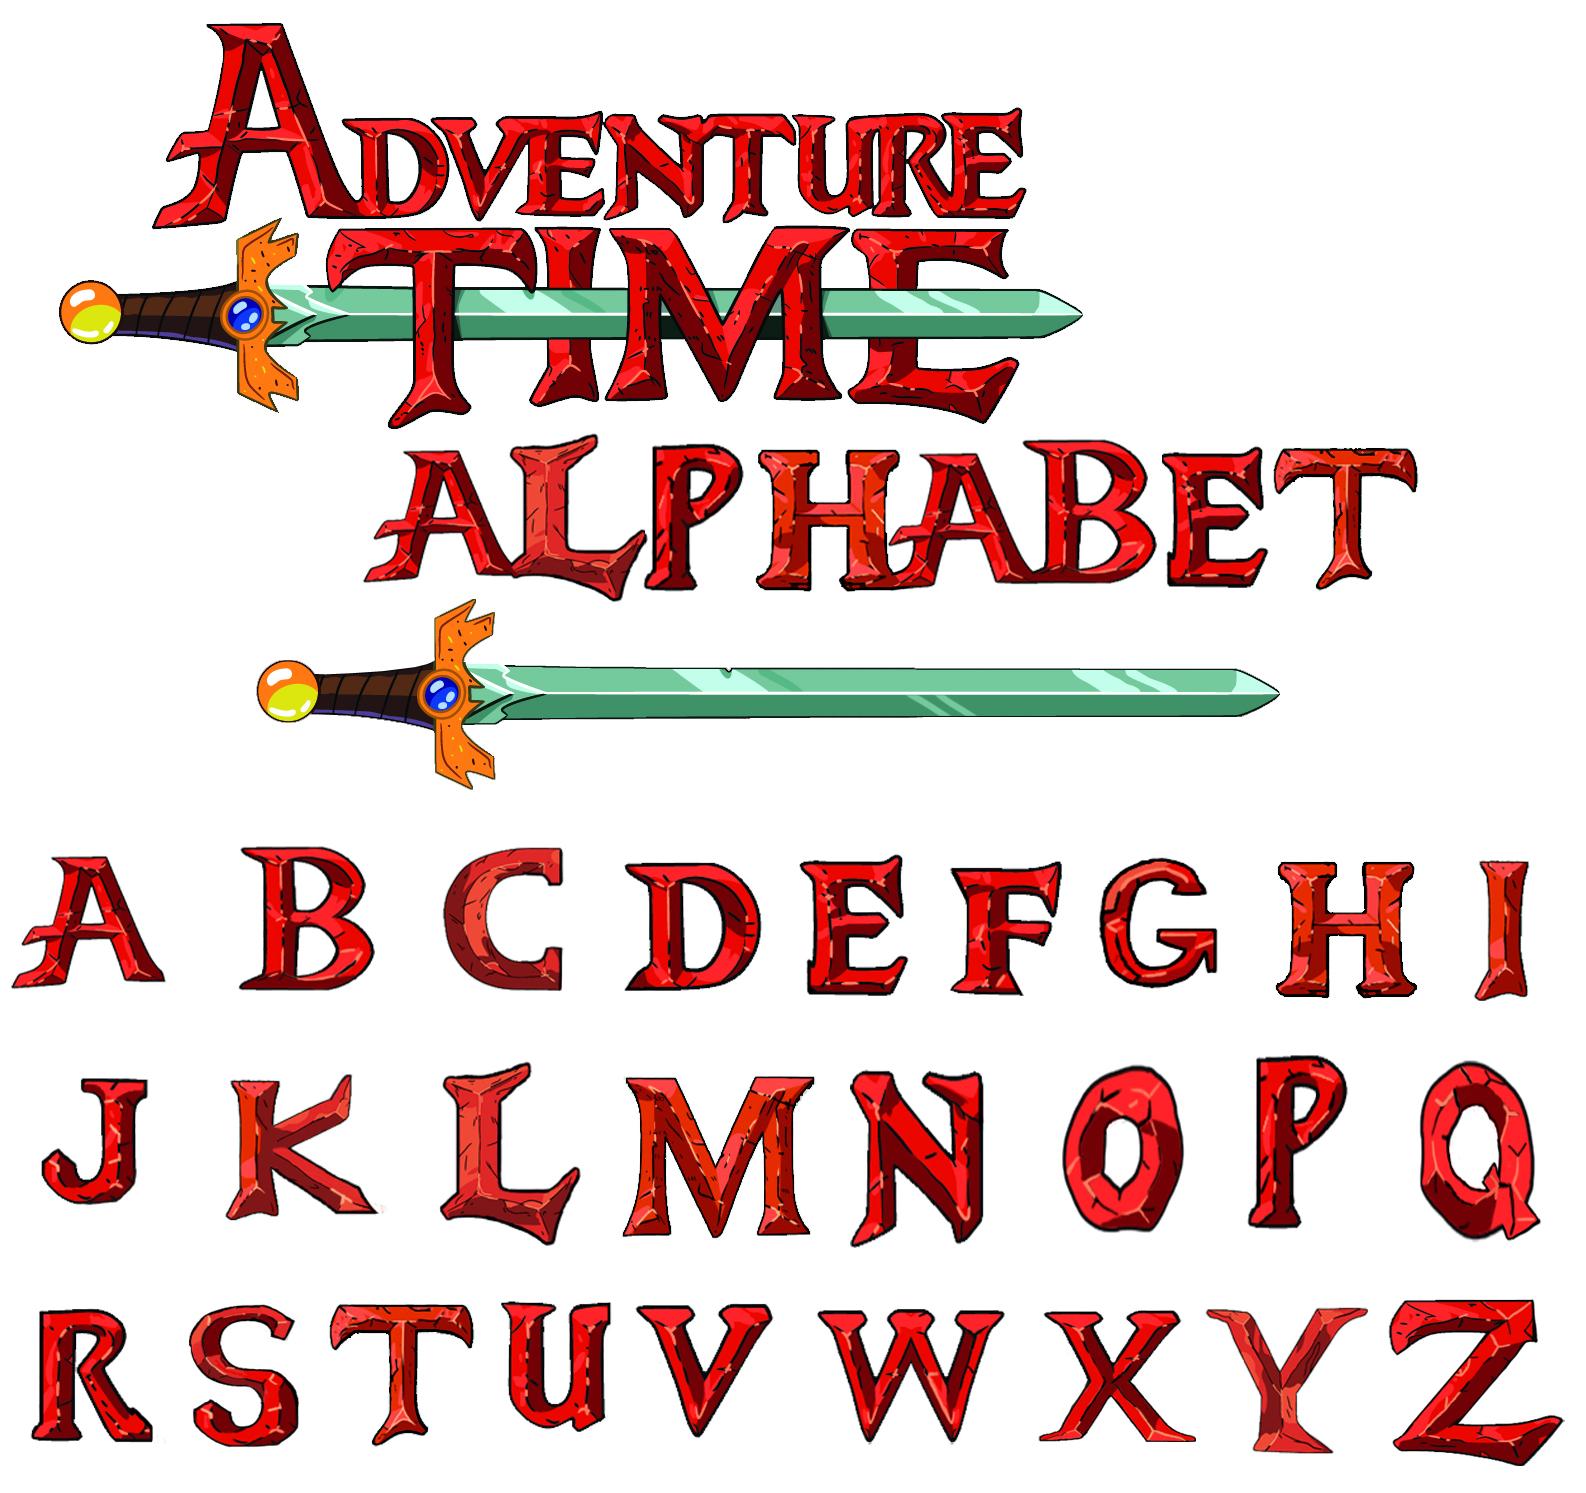 Http Ask Angelo Deviantart Com Art At Font Alphabet 322432506 Adventure Time Adventure Time Printables